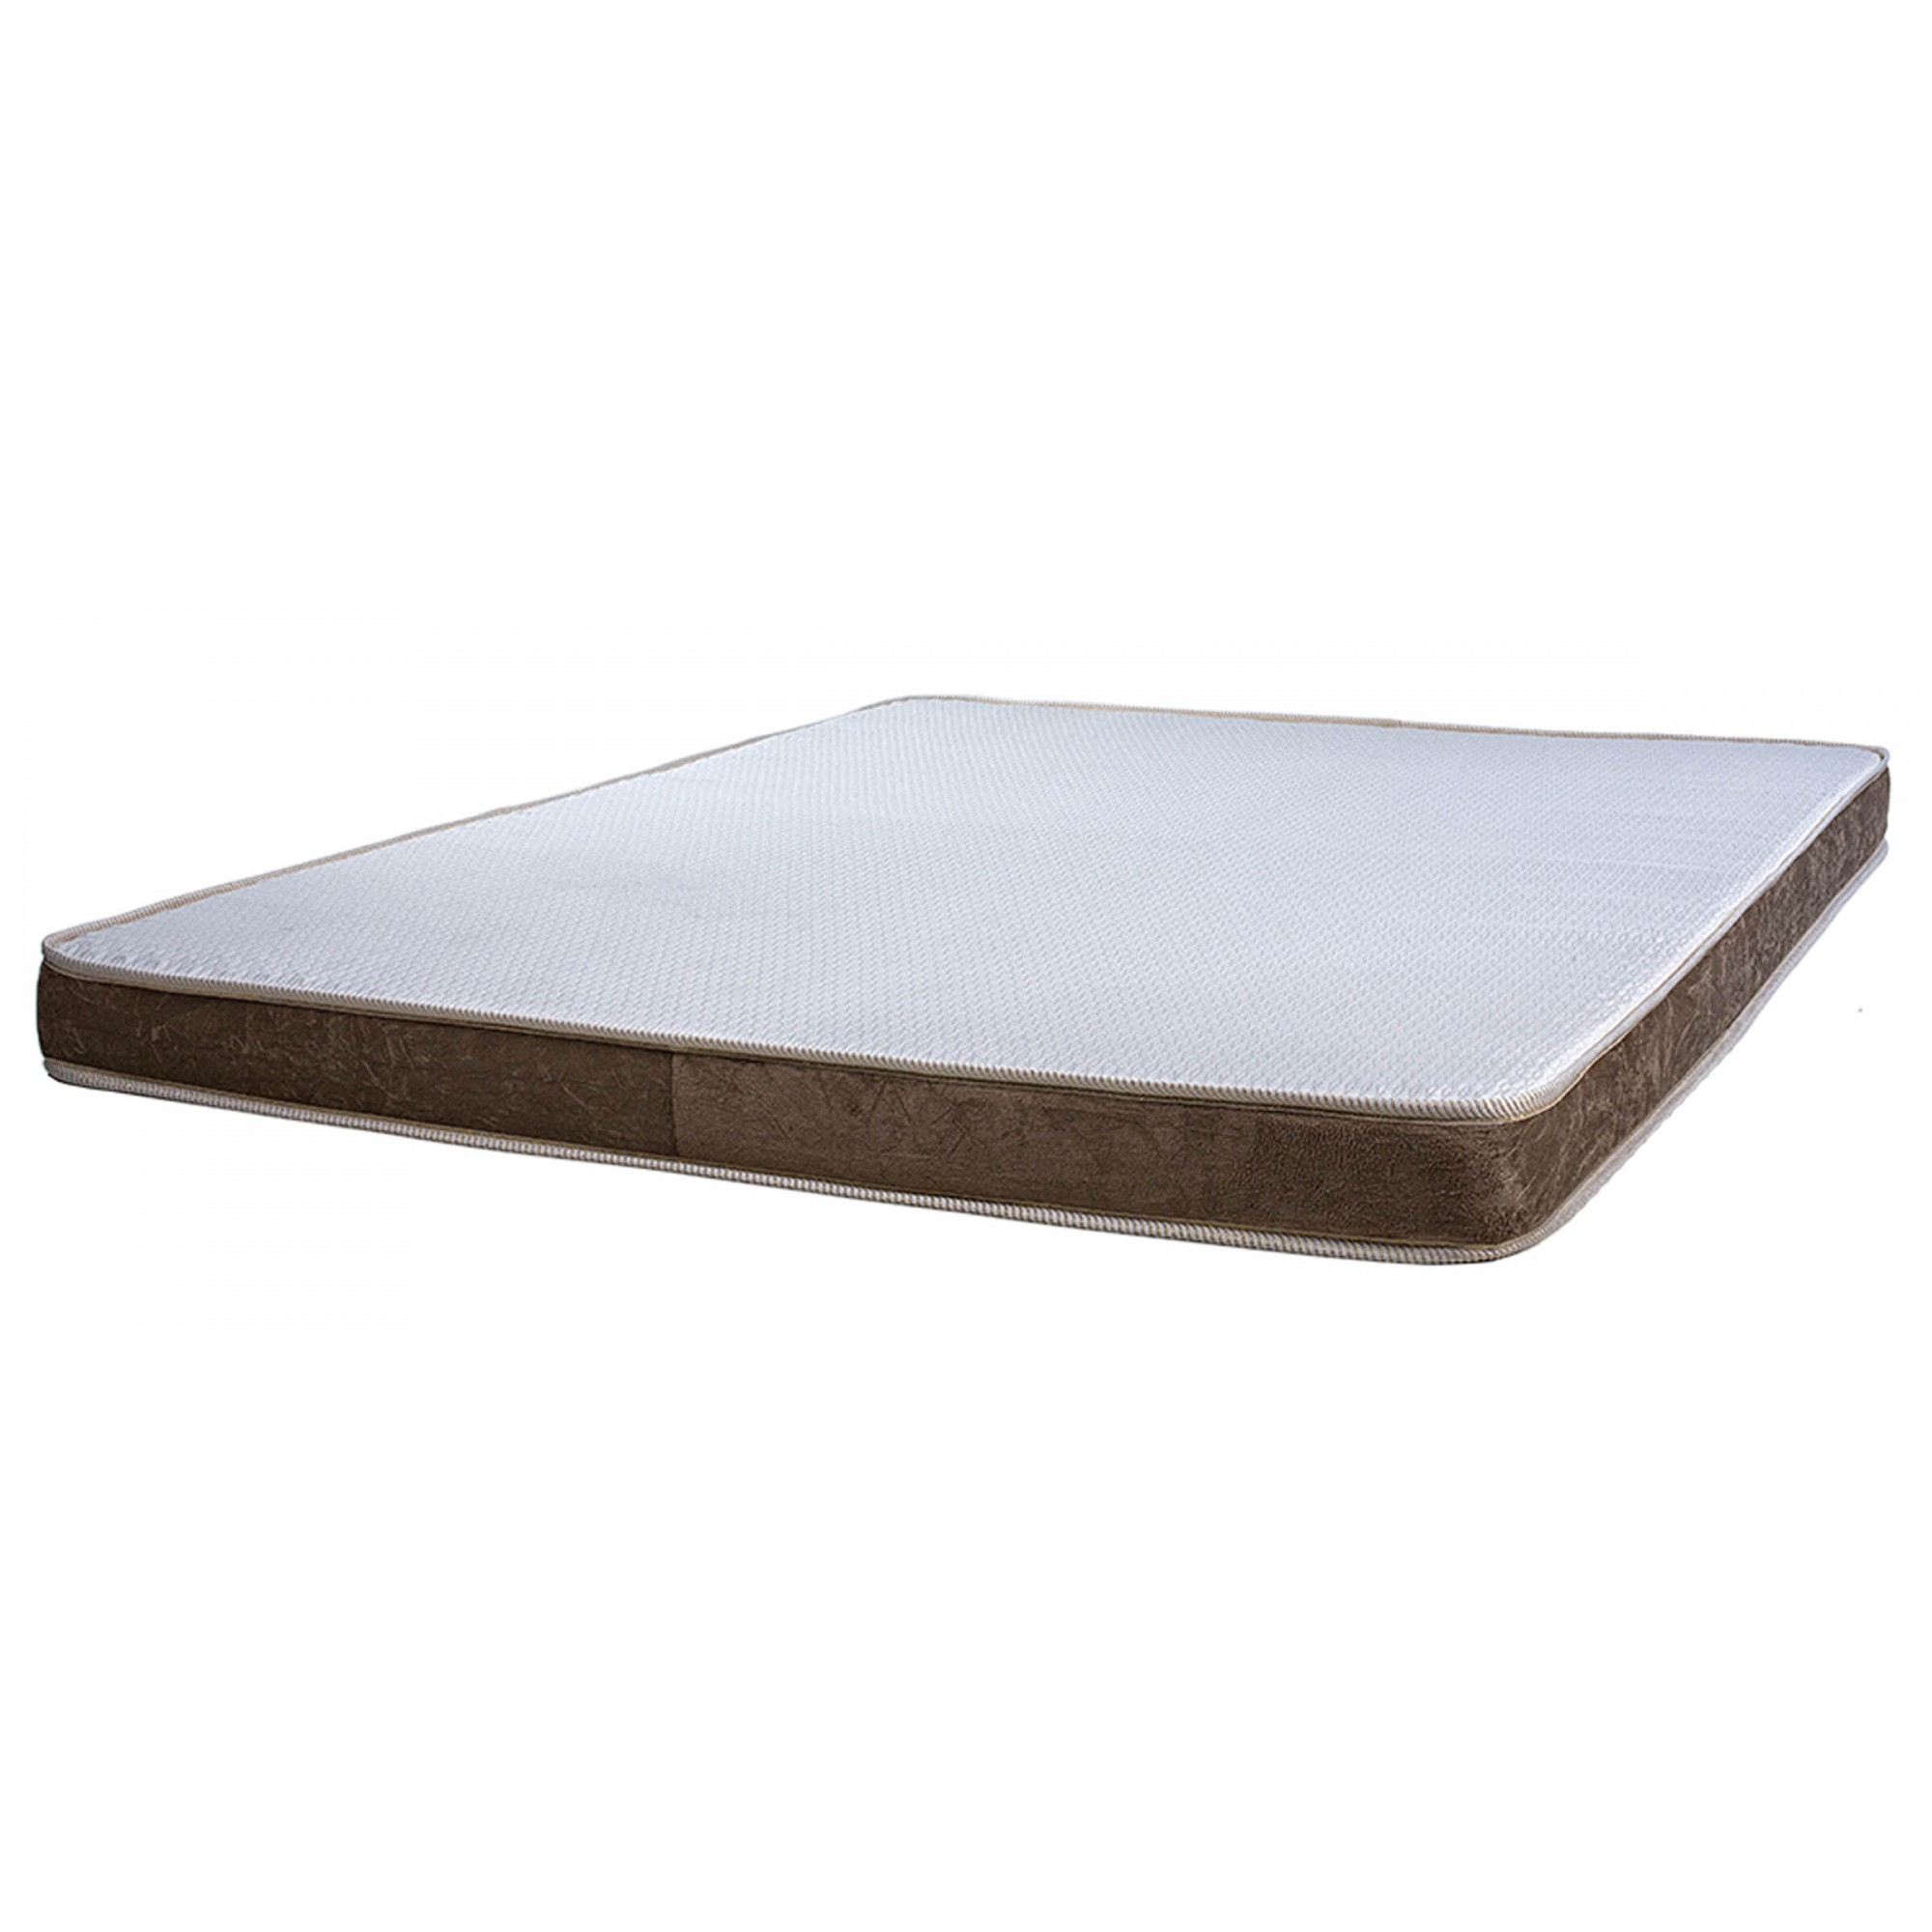 Manta Magnética Colchonete Kenko Premium Casal 1,38x1,88x10cm  - Kenko Premium Colchões